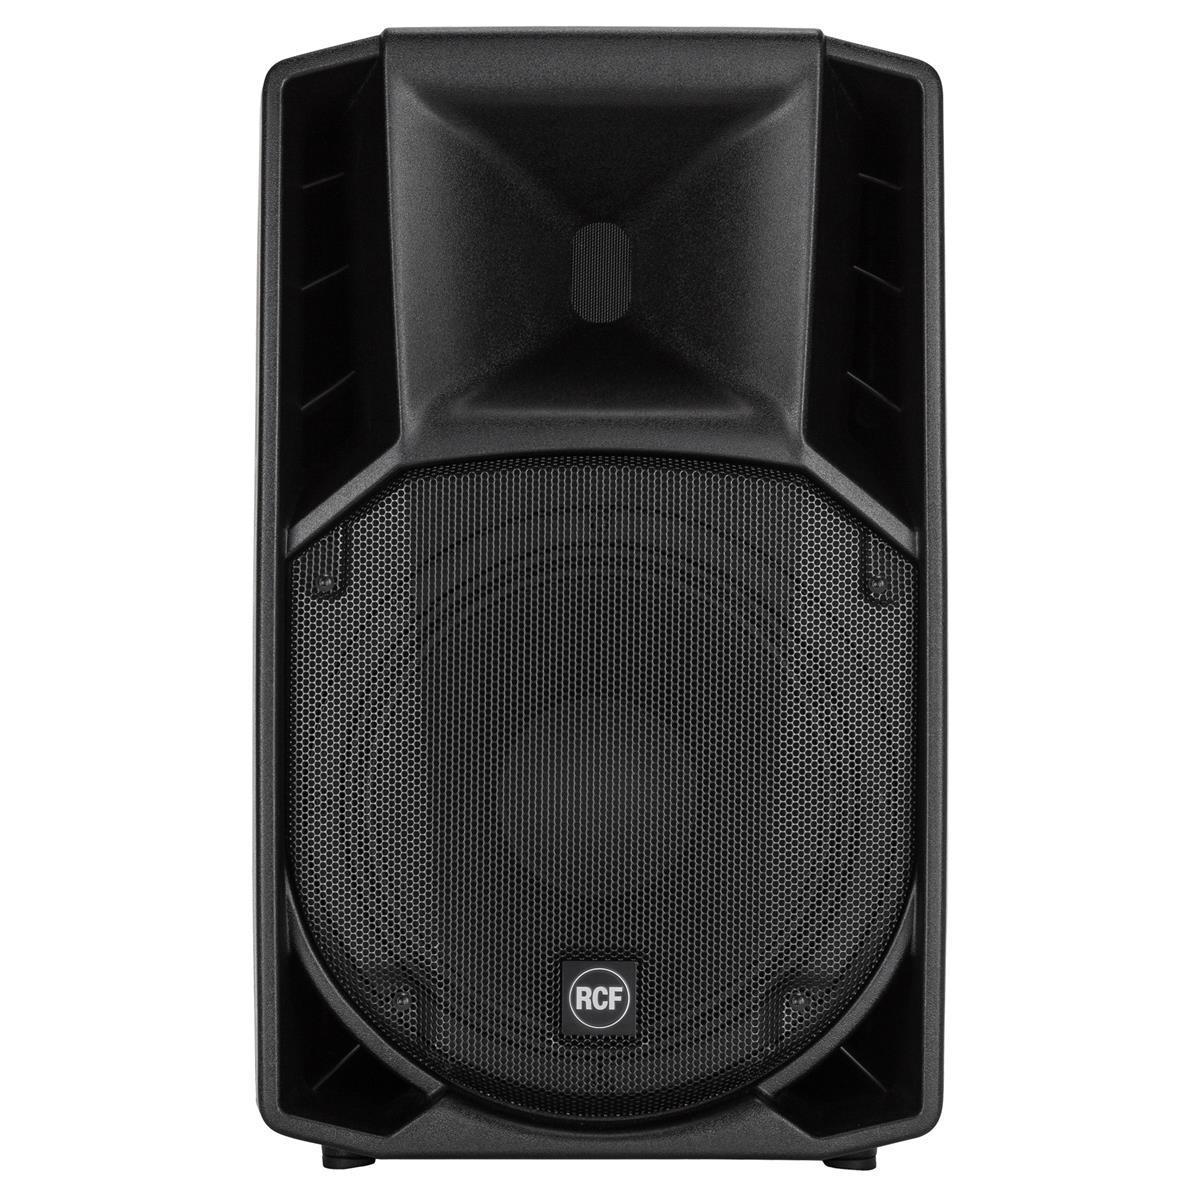 RCF ART 712-A MK4 Digital active speaker system 12in + 1in,